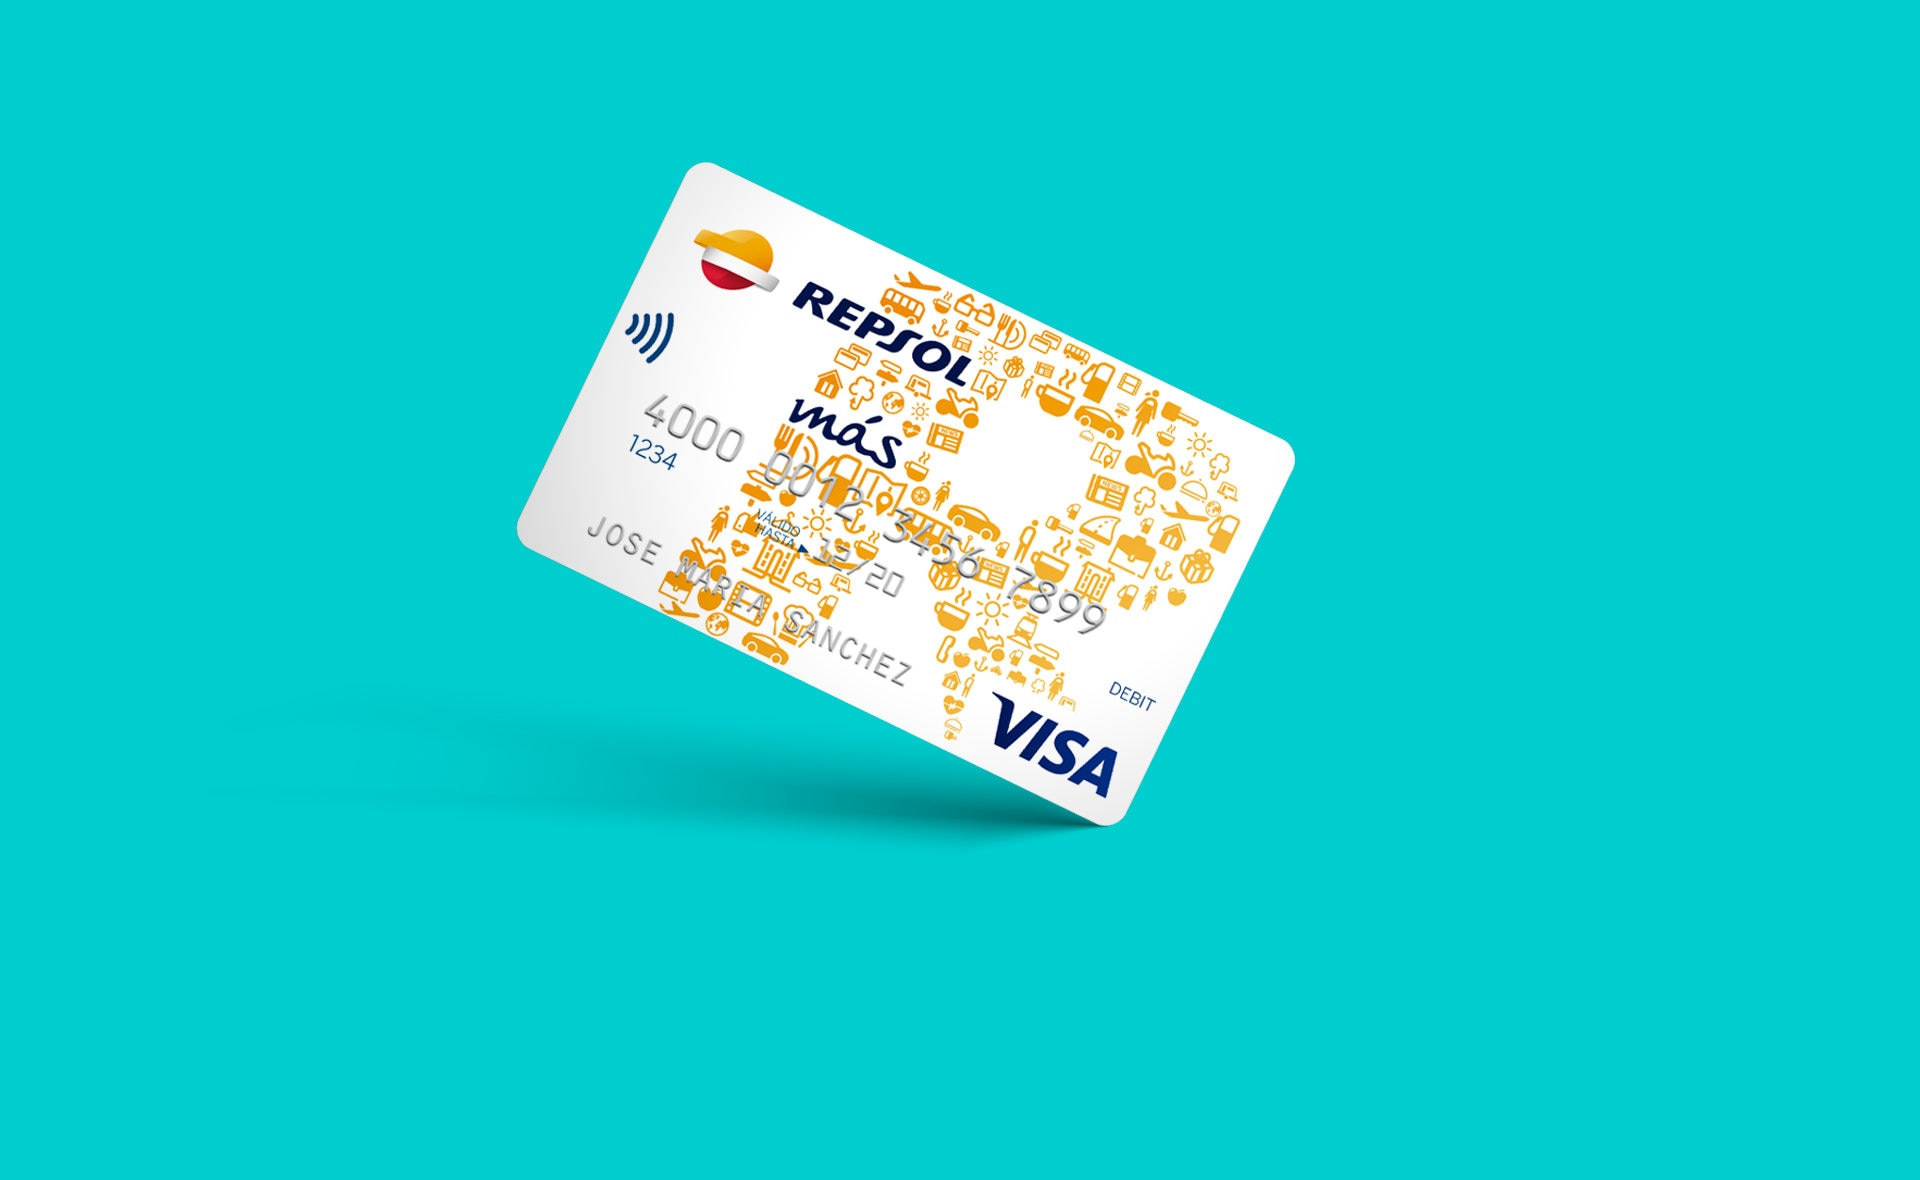 BBVA-visa-repsol-online-tarjeta-cuenta-online-combustible